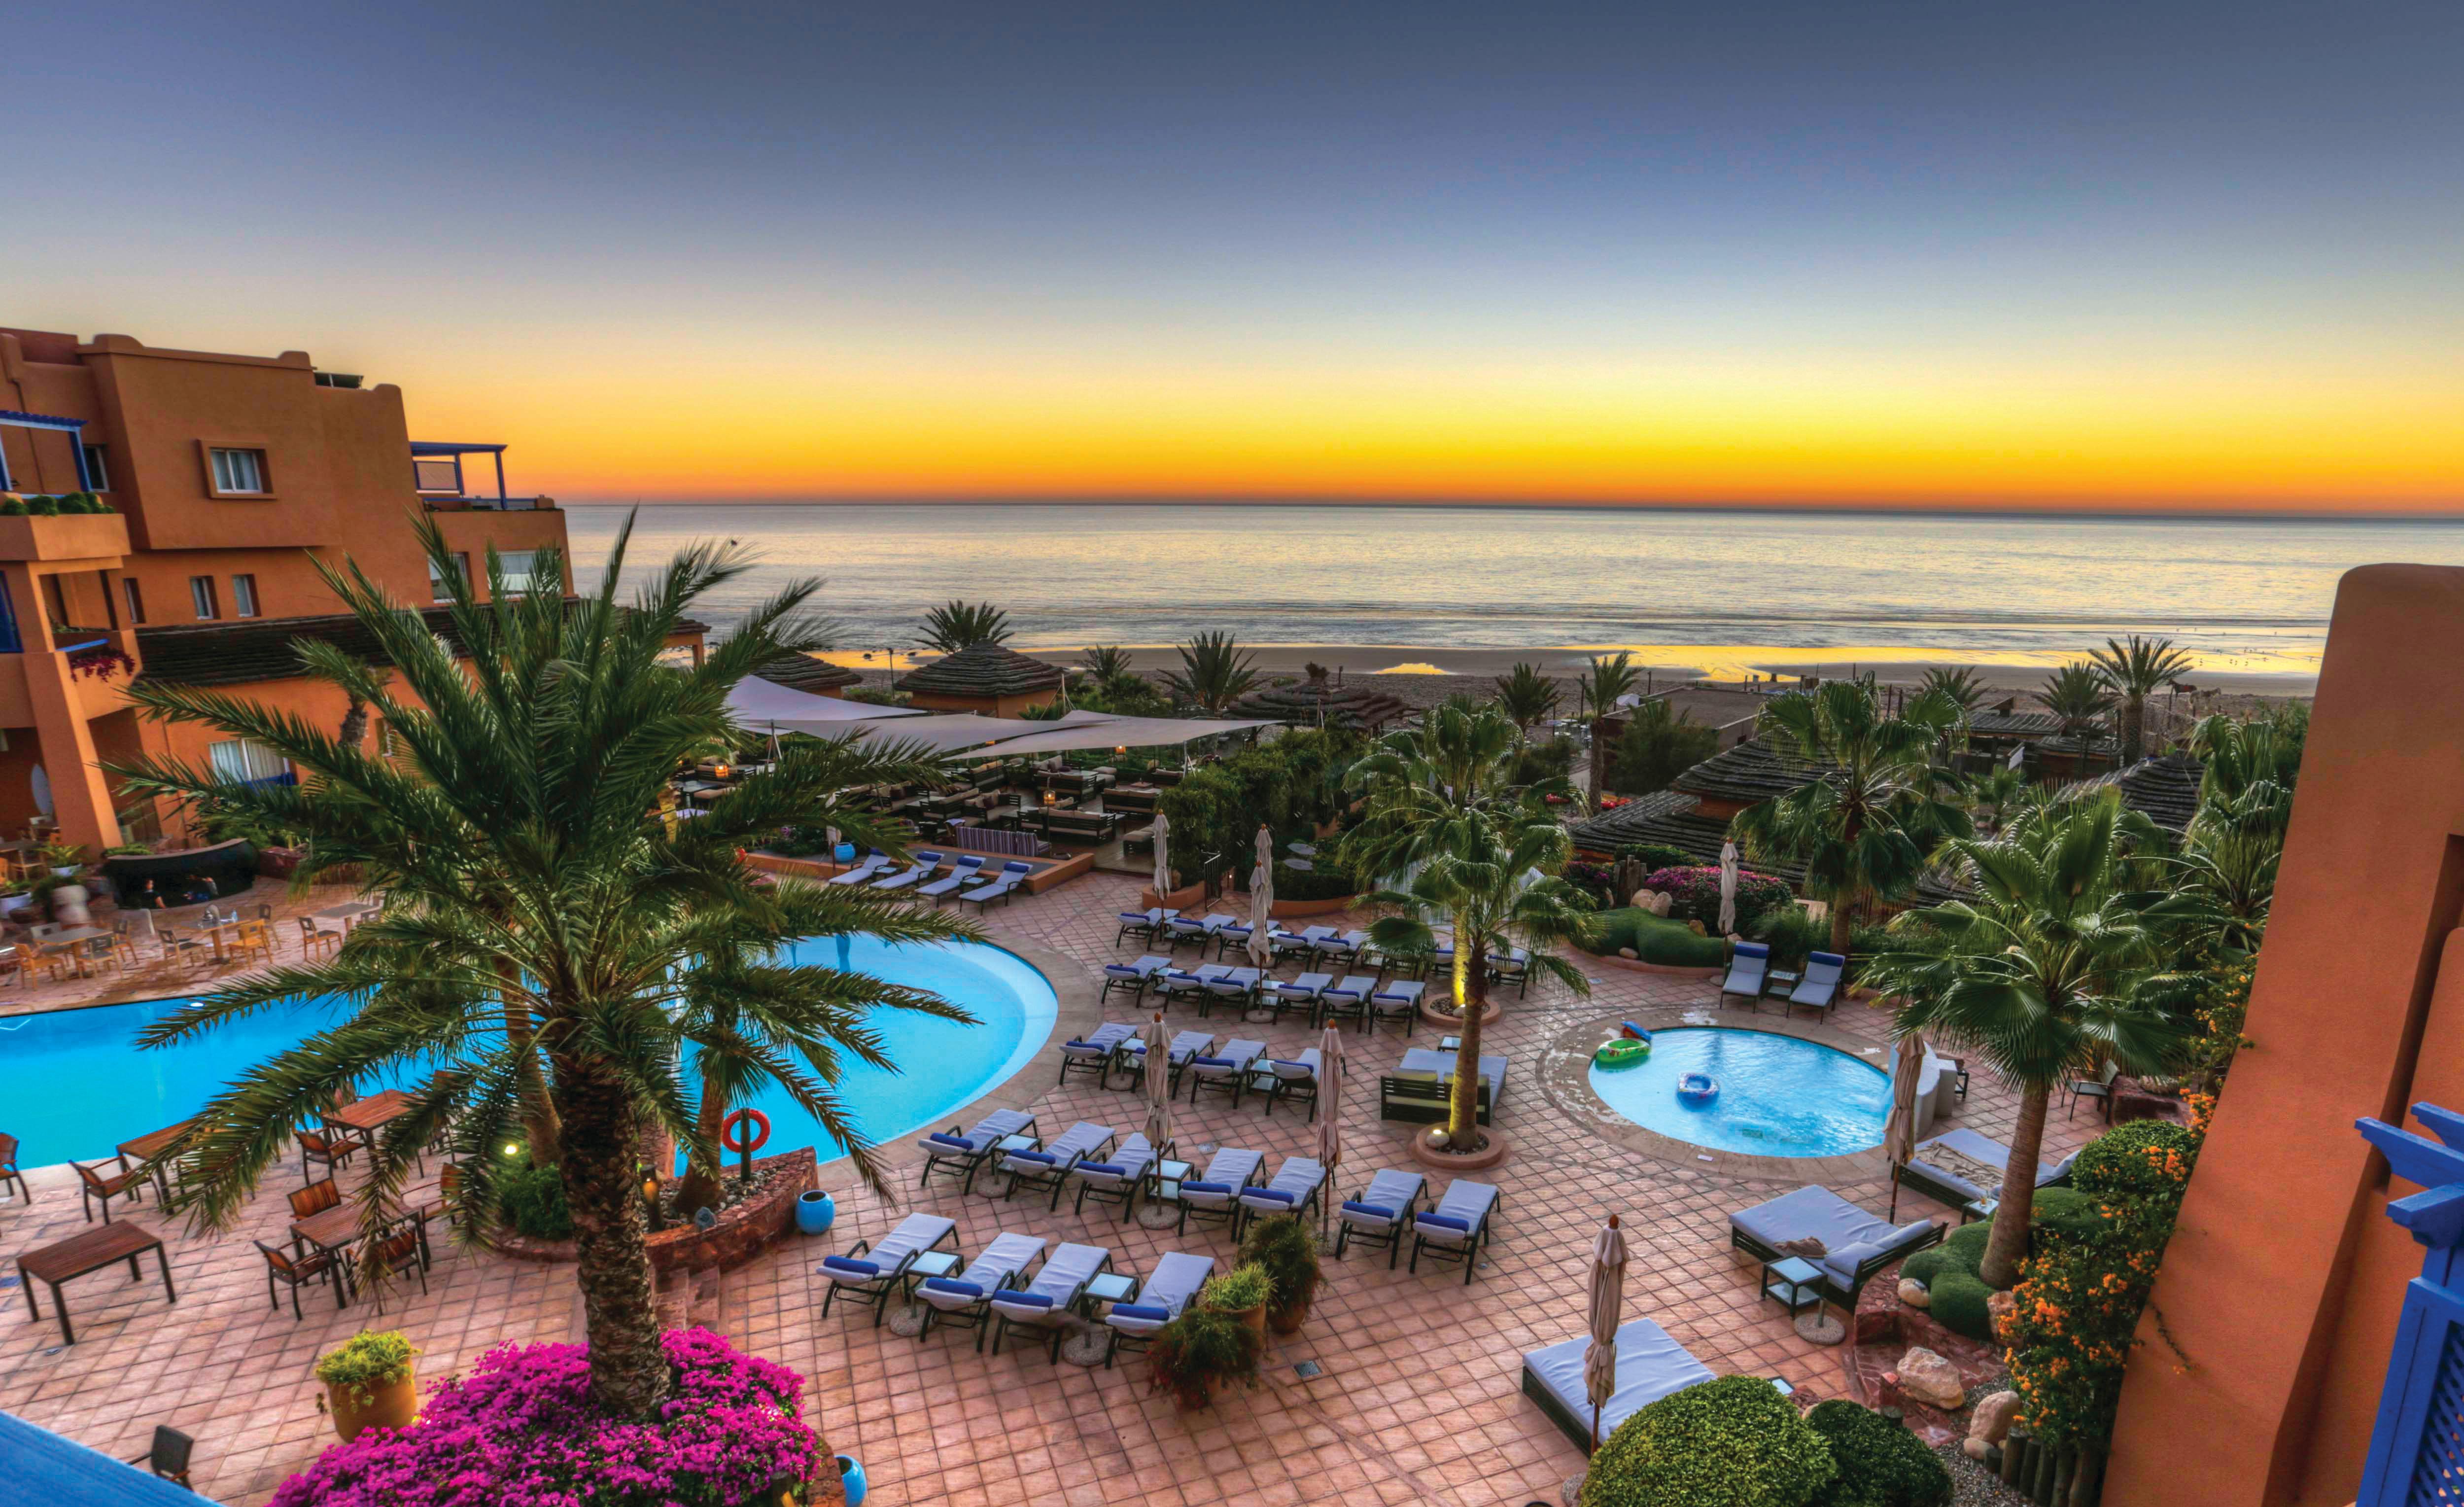 paradis-plage-resort-agadir